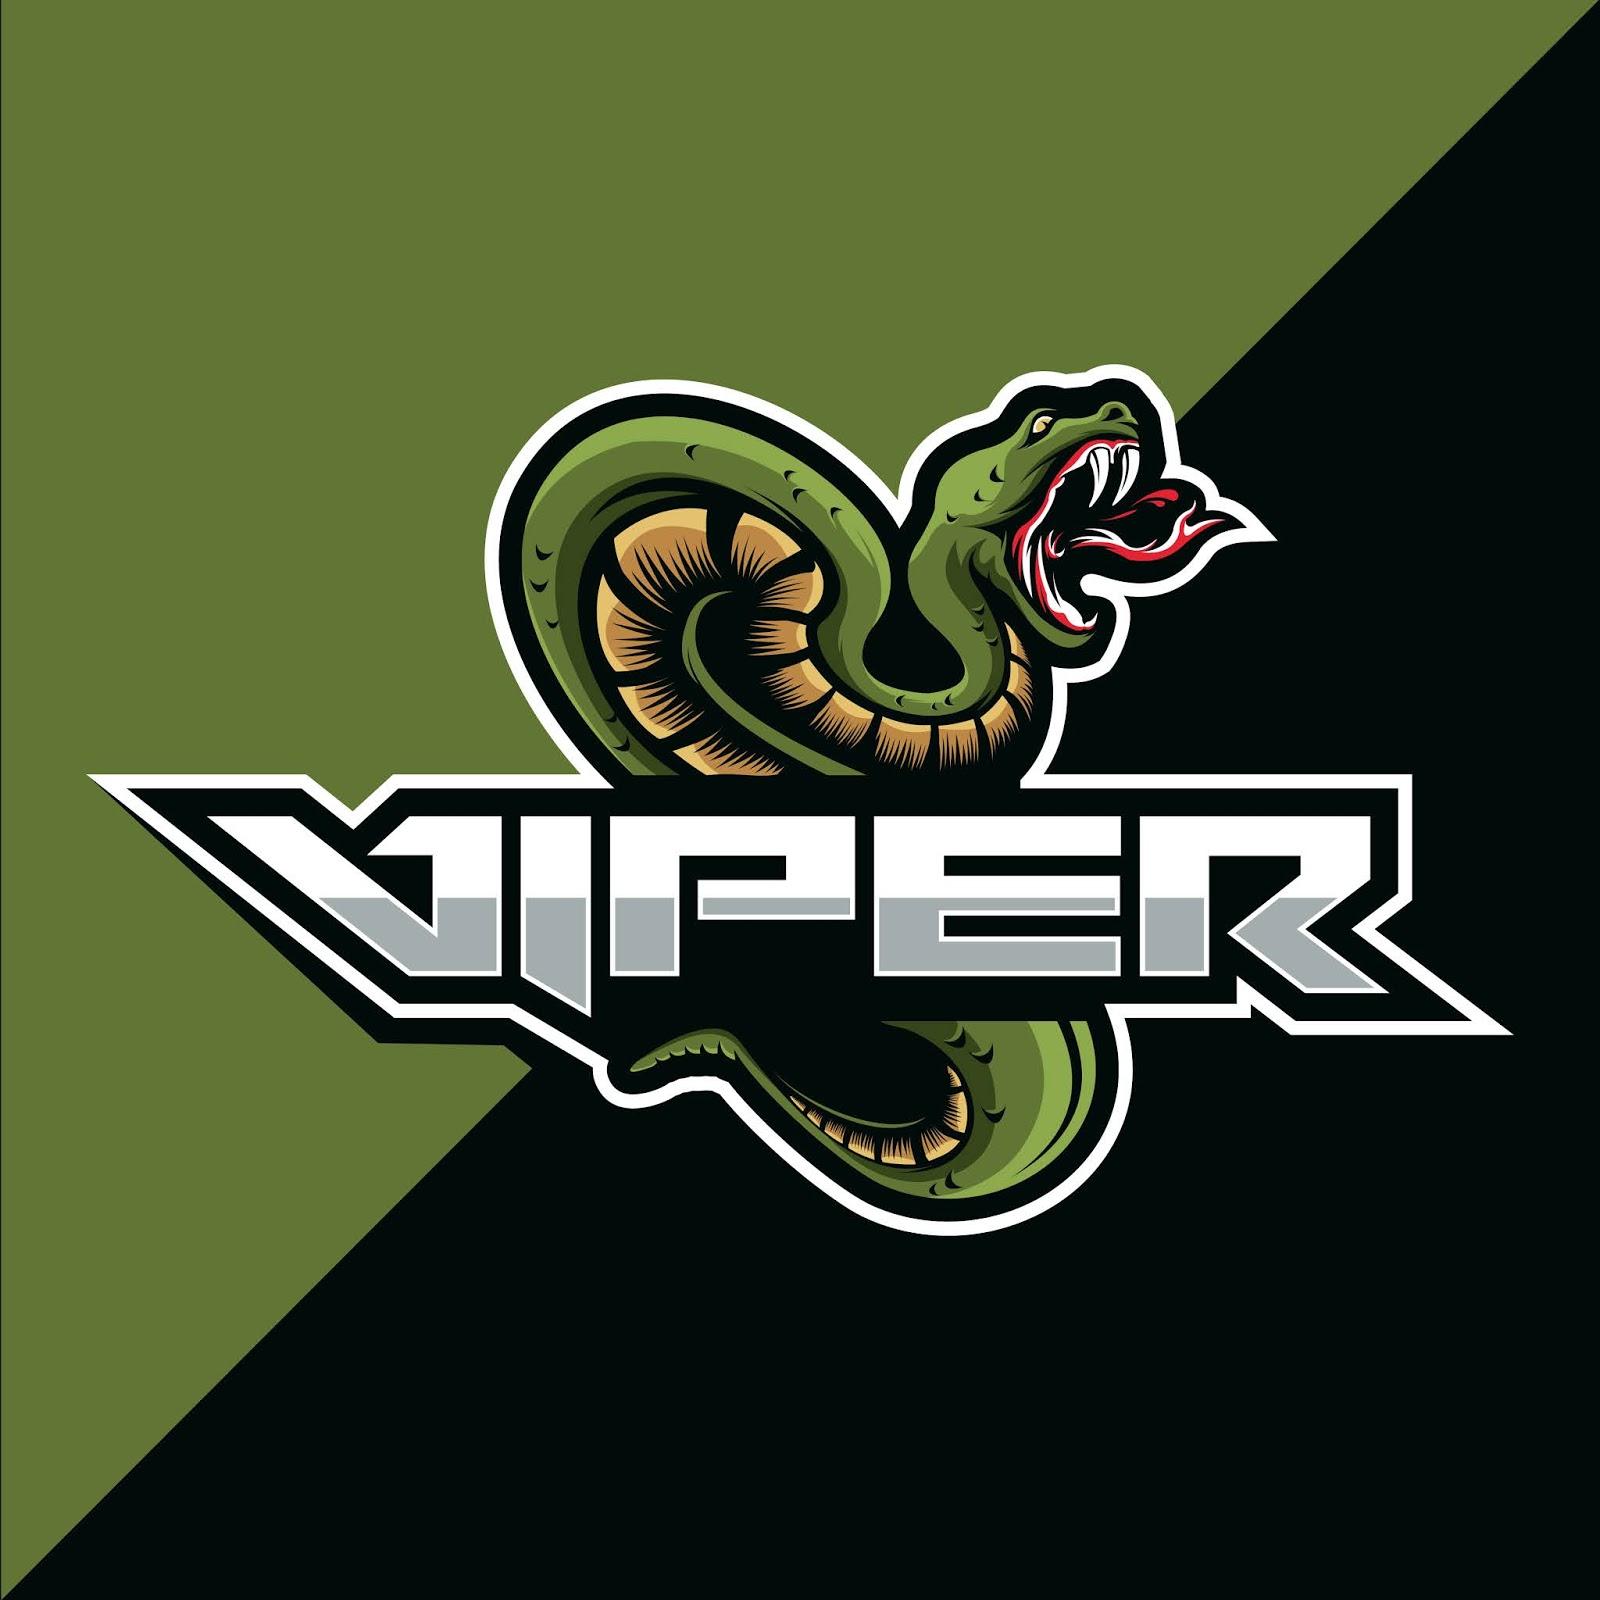 Viper Snake Mascot Esport Logo Design Free Download Vector CDR, AI, EPS and PNG Formats